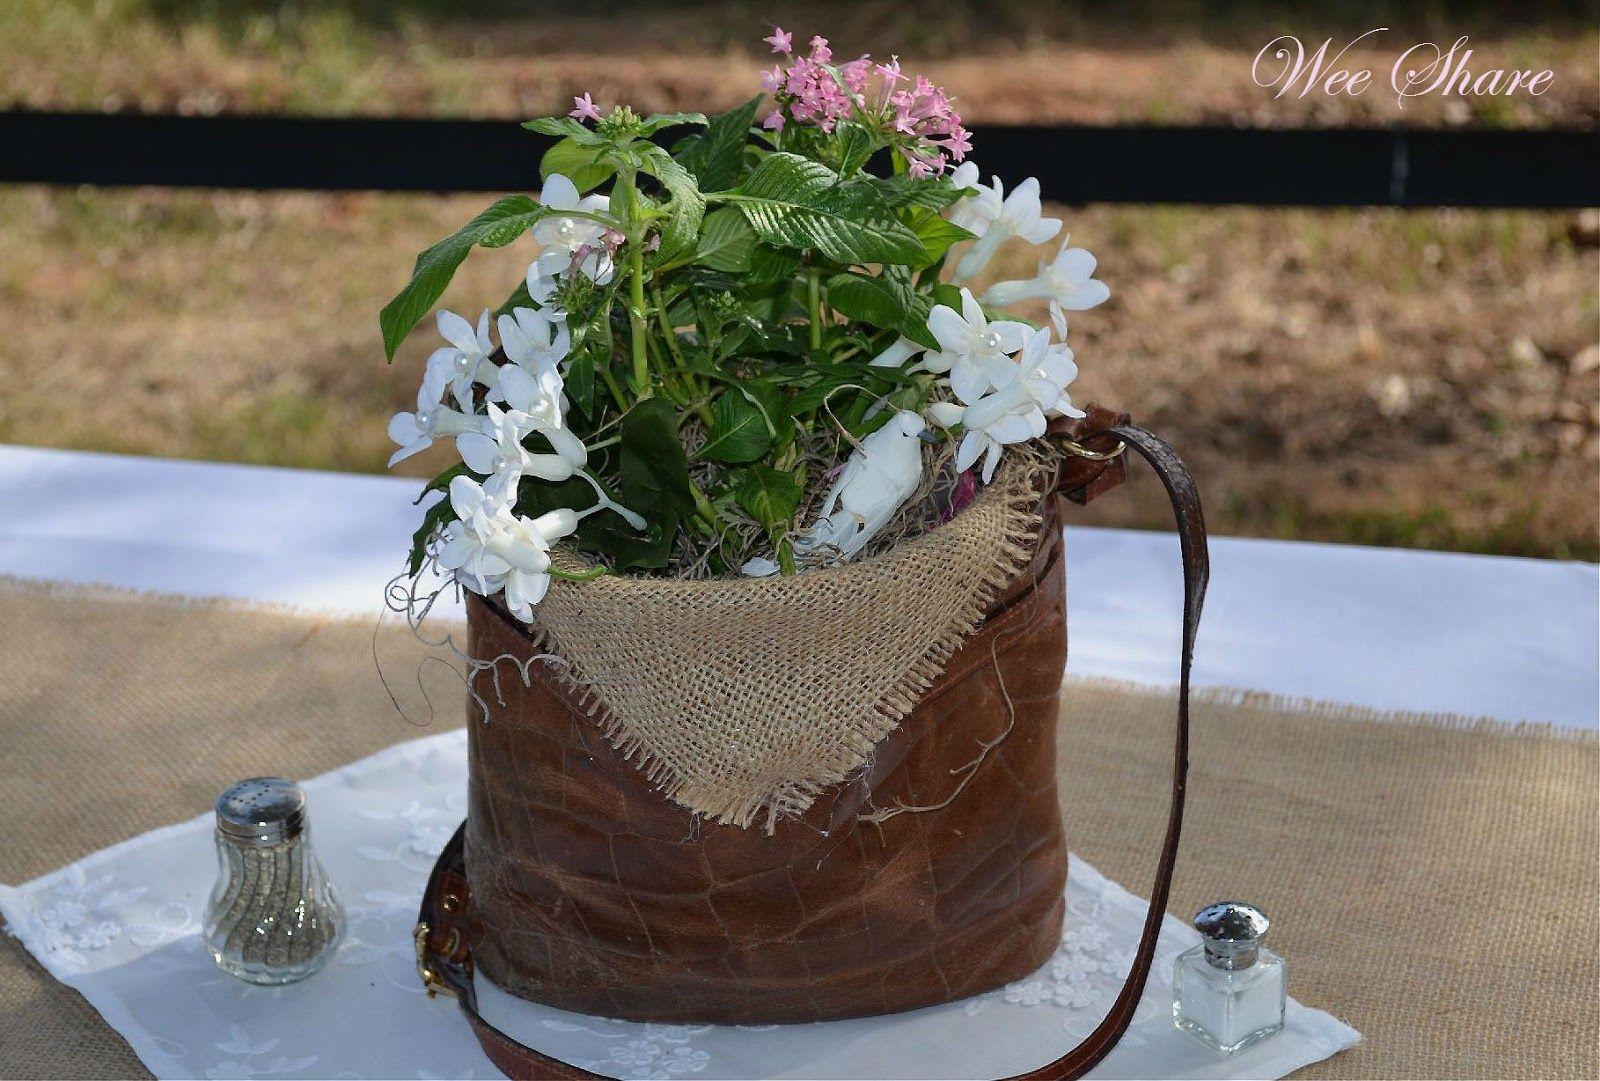 Leather Handbag Vase Centerpiece